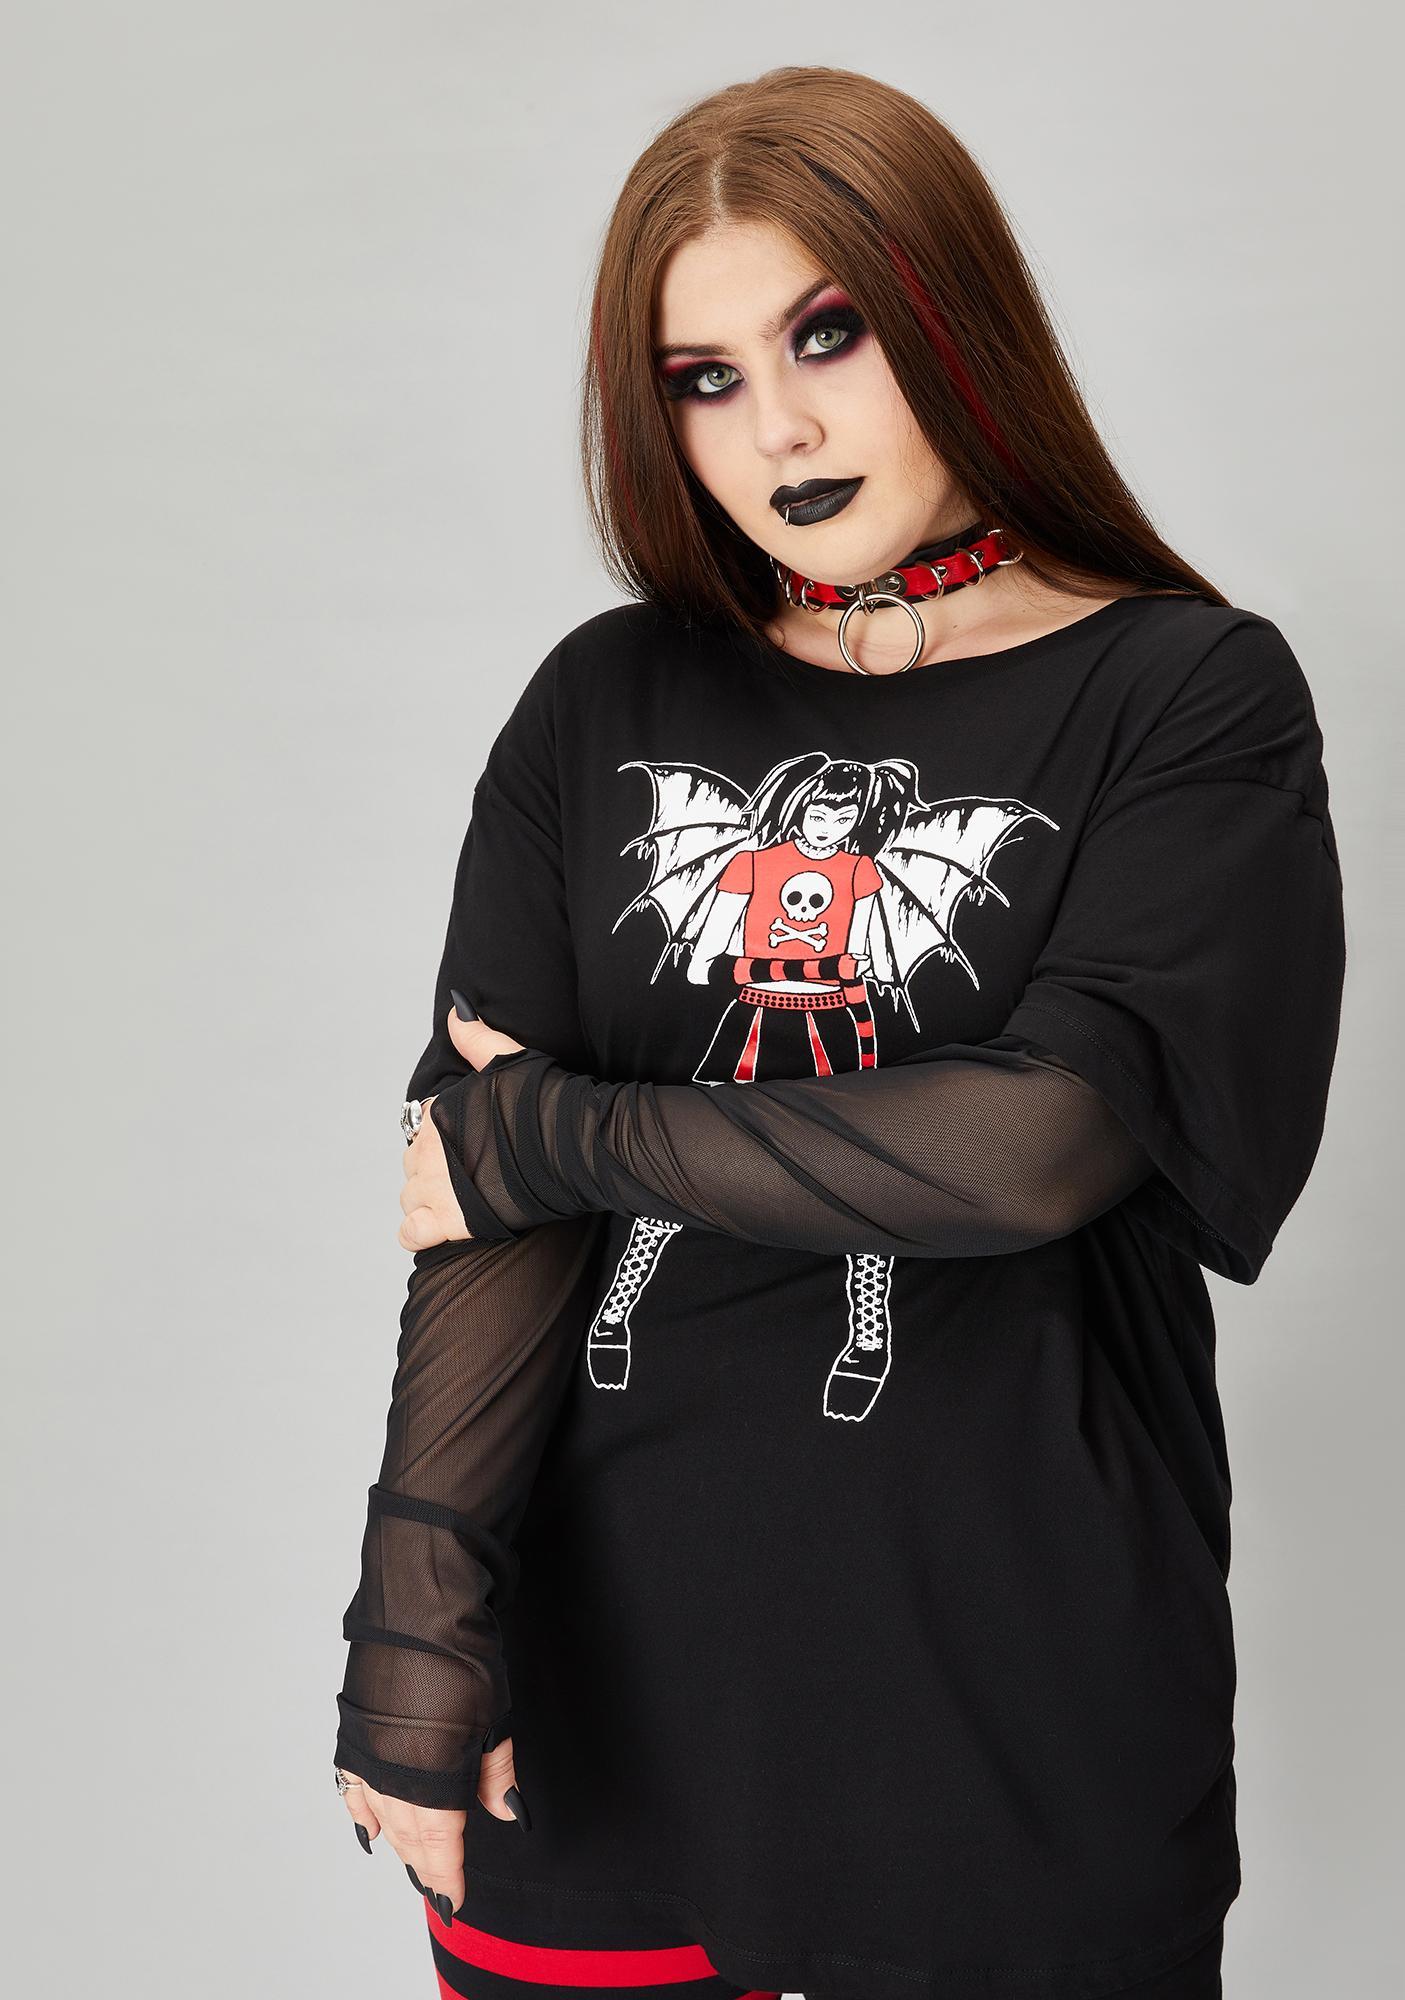 Widow Divine Miss Misery Layered Graphic Tee